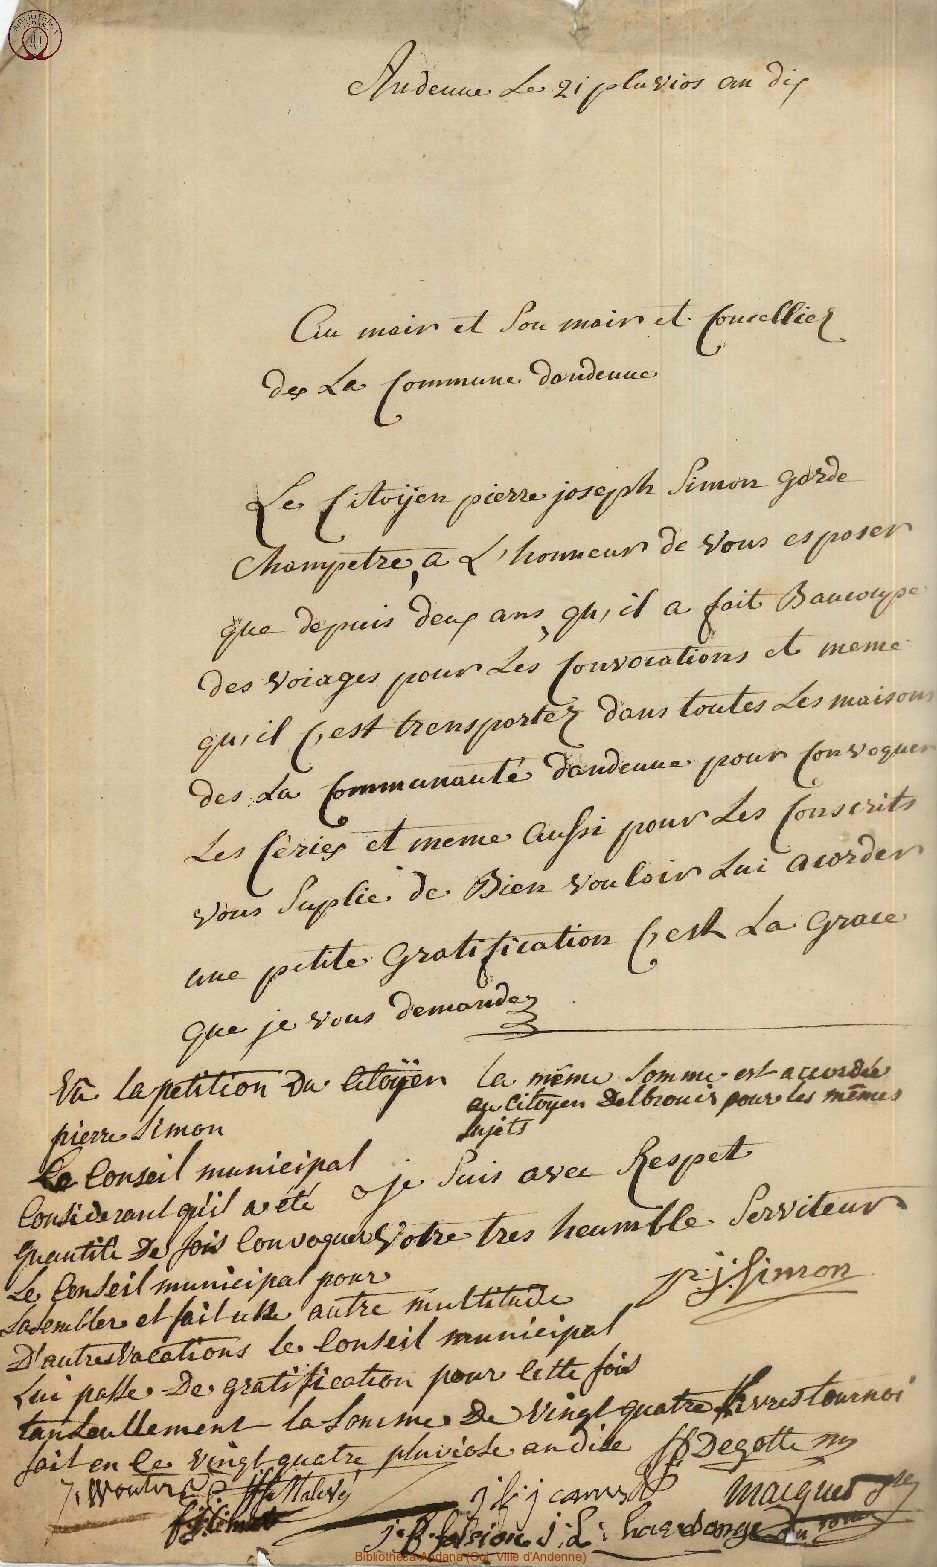 1802-02-1 (21 pluviôse an 10)